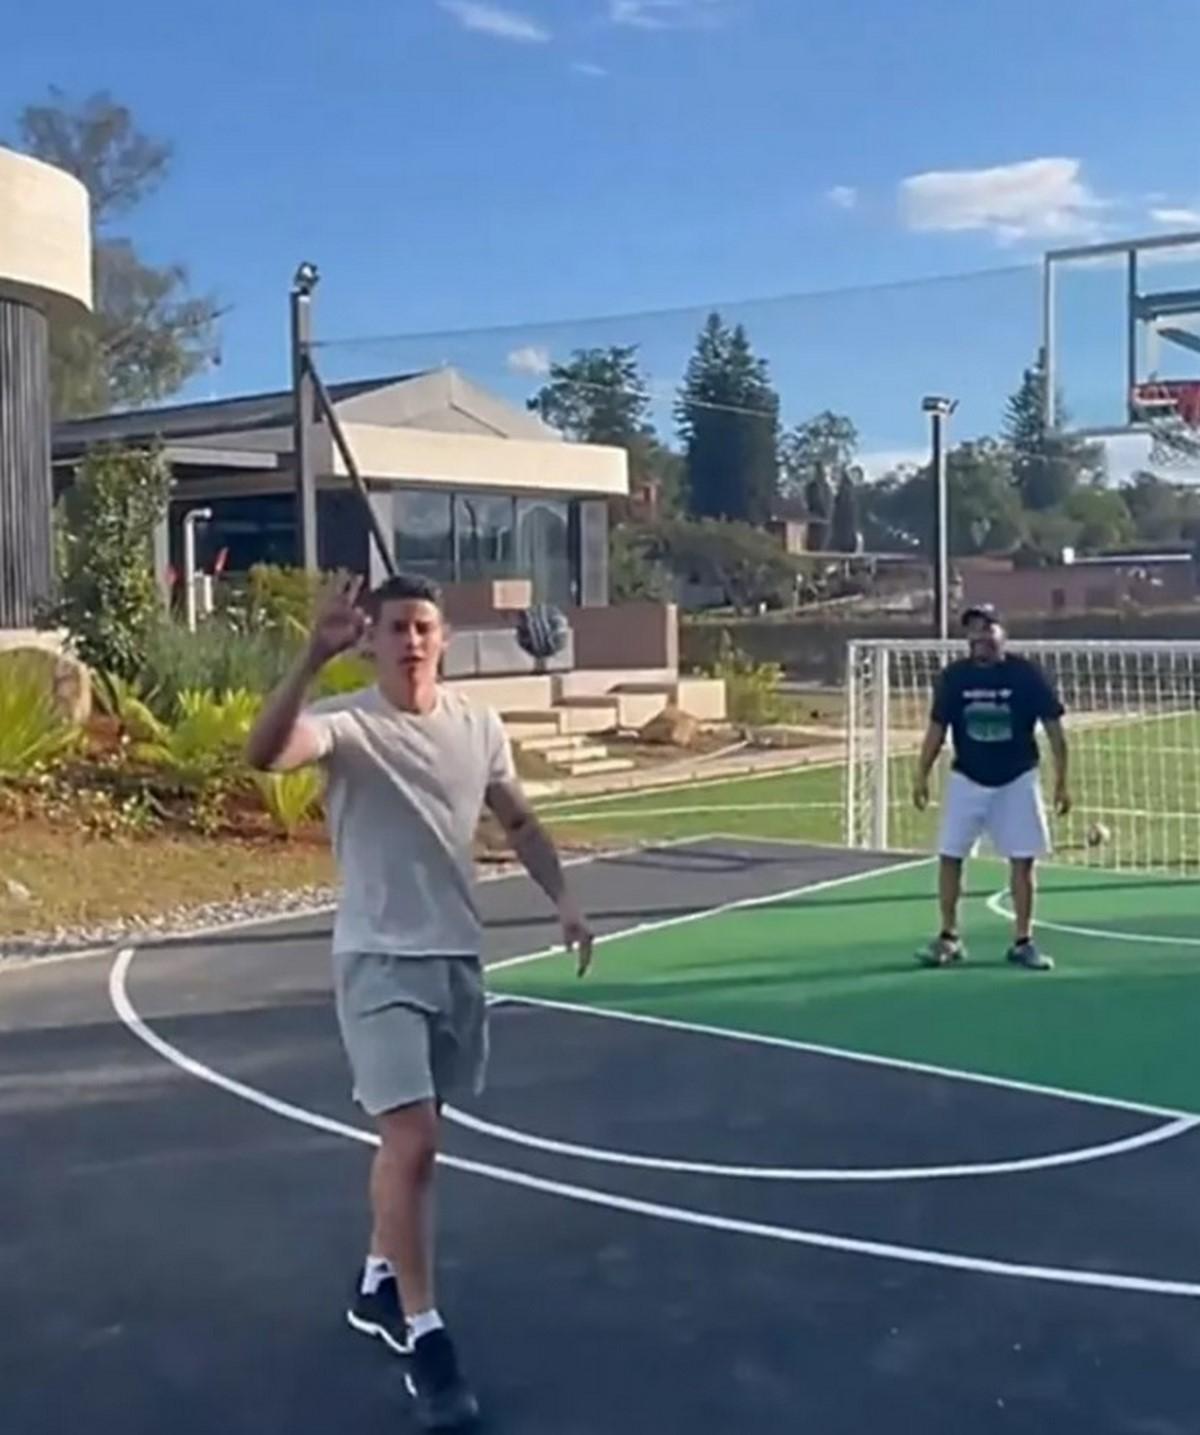 james baloncesto 3 rondas